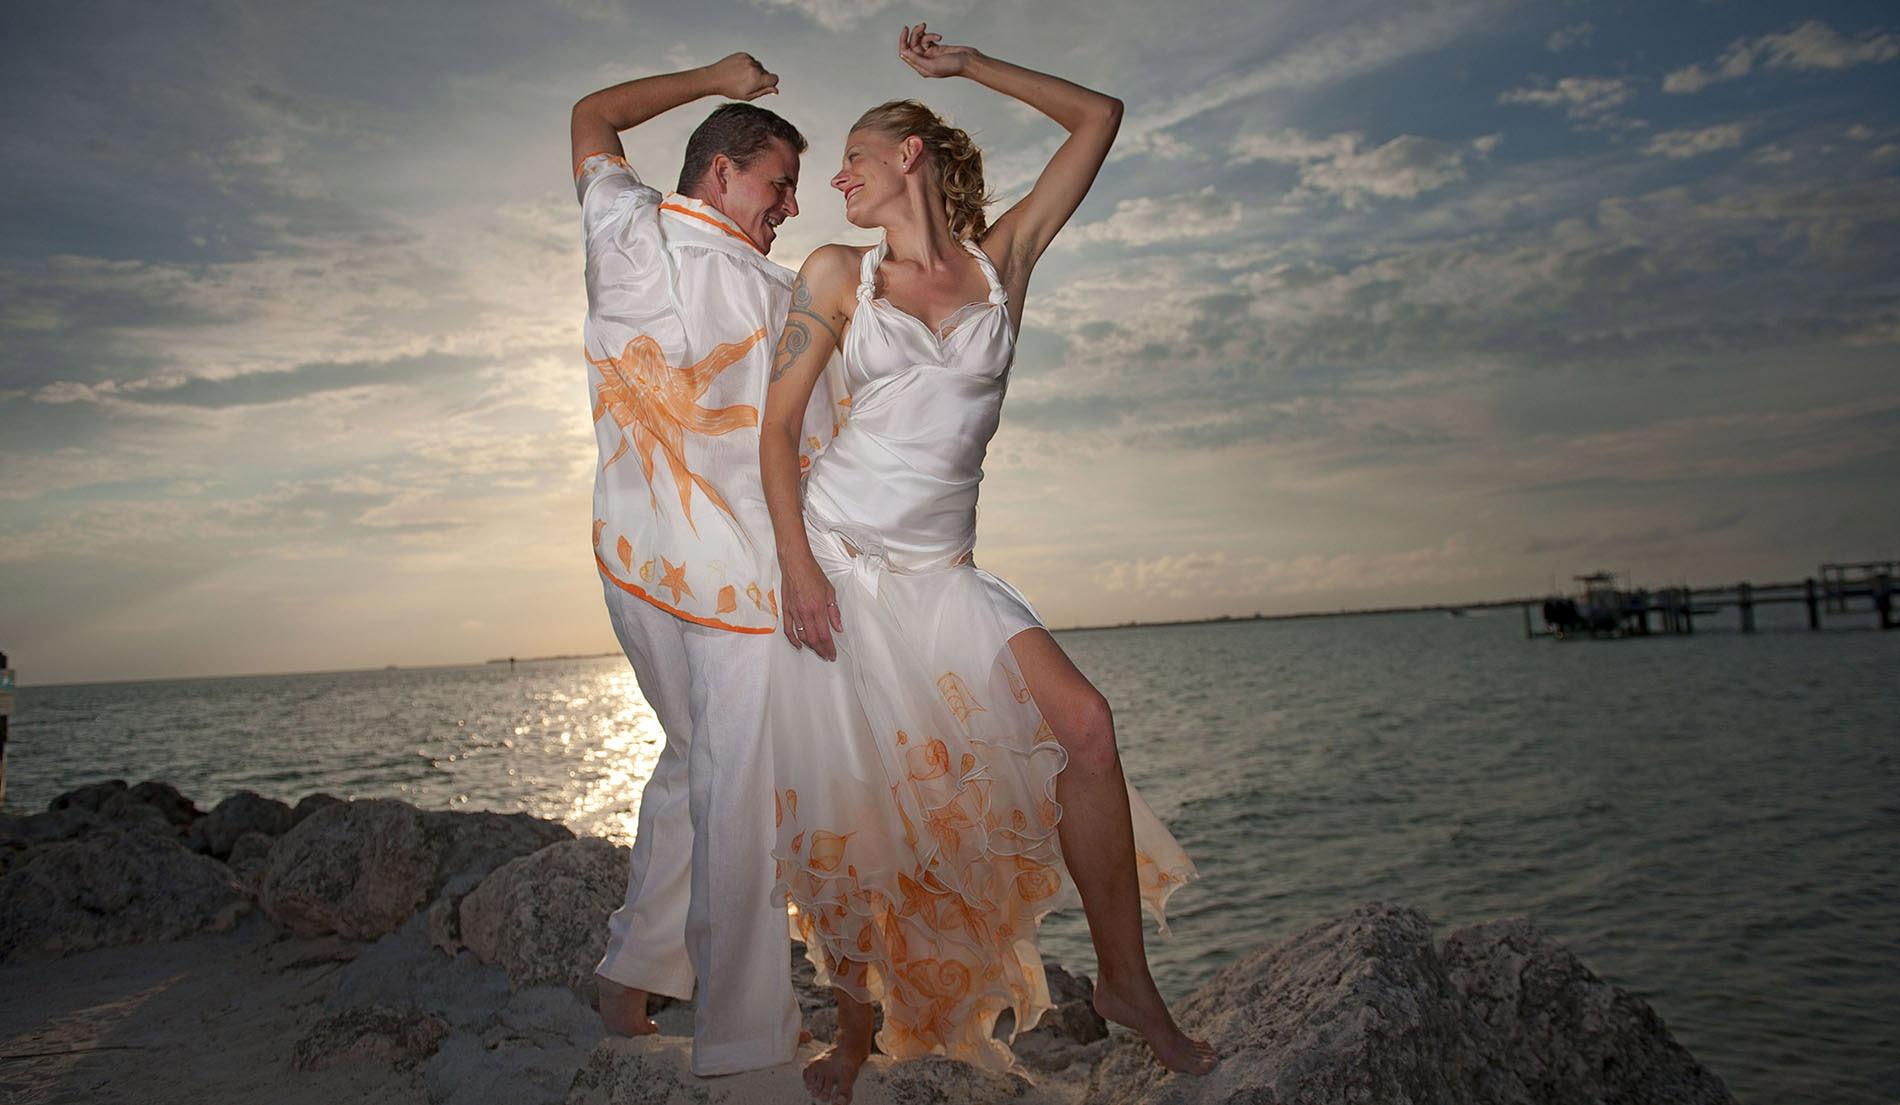 Destination Wedding Attire for Groom and Groomsmen